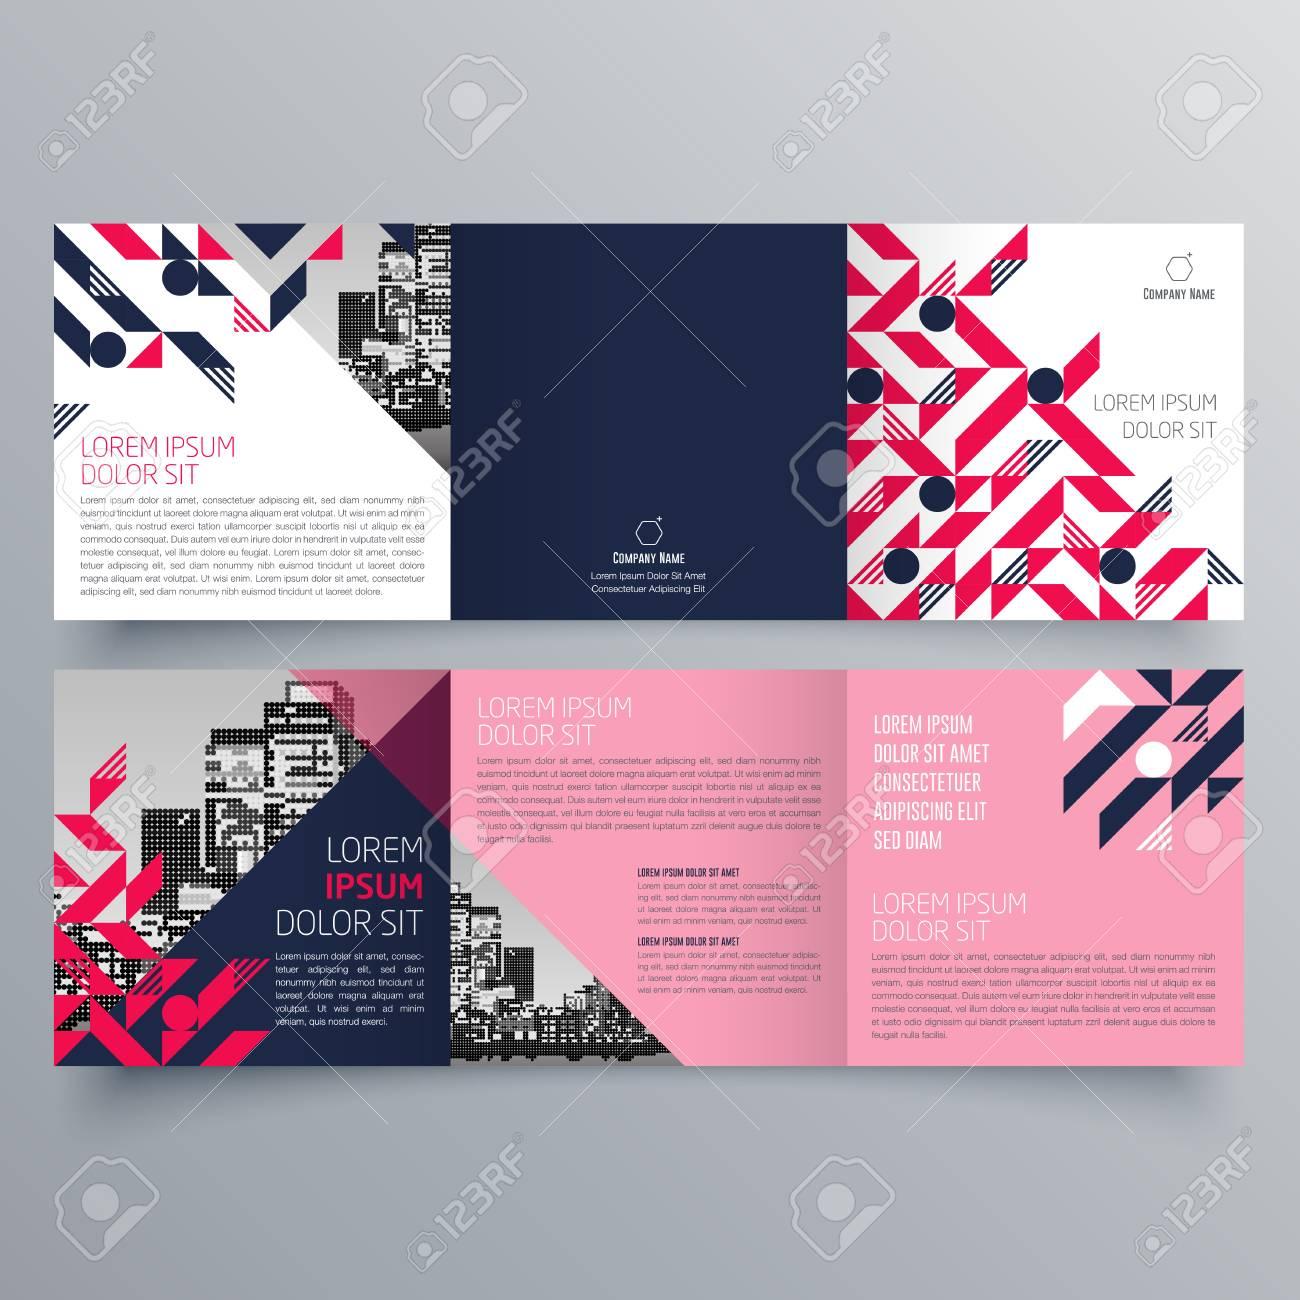 Brochure design, brochure template, creative tri-fold, trend